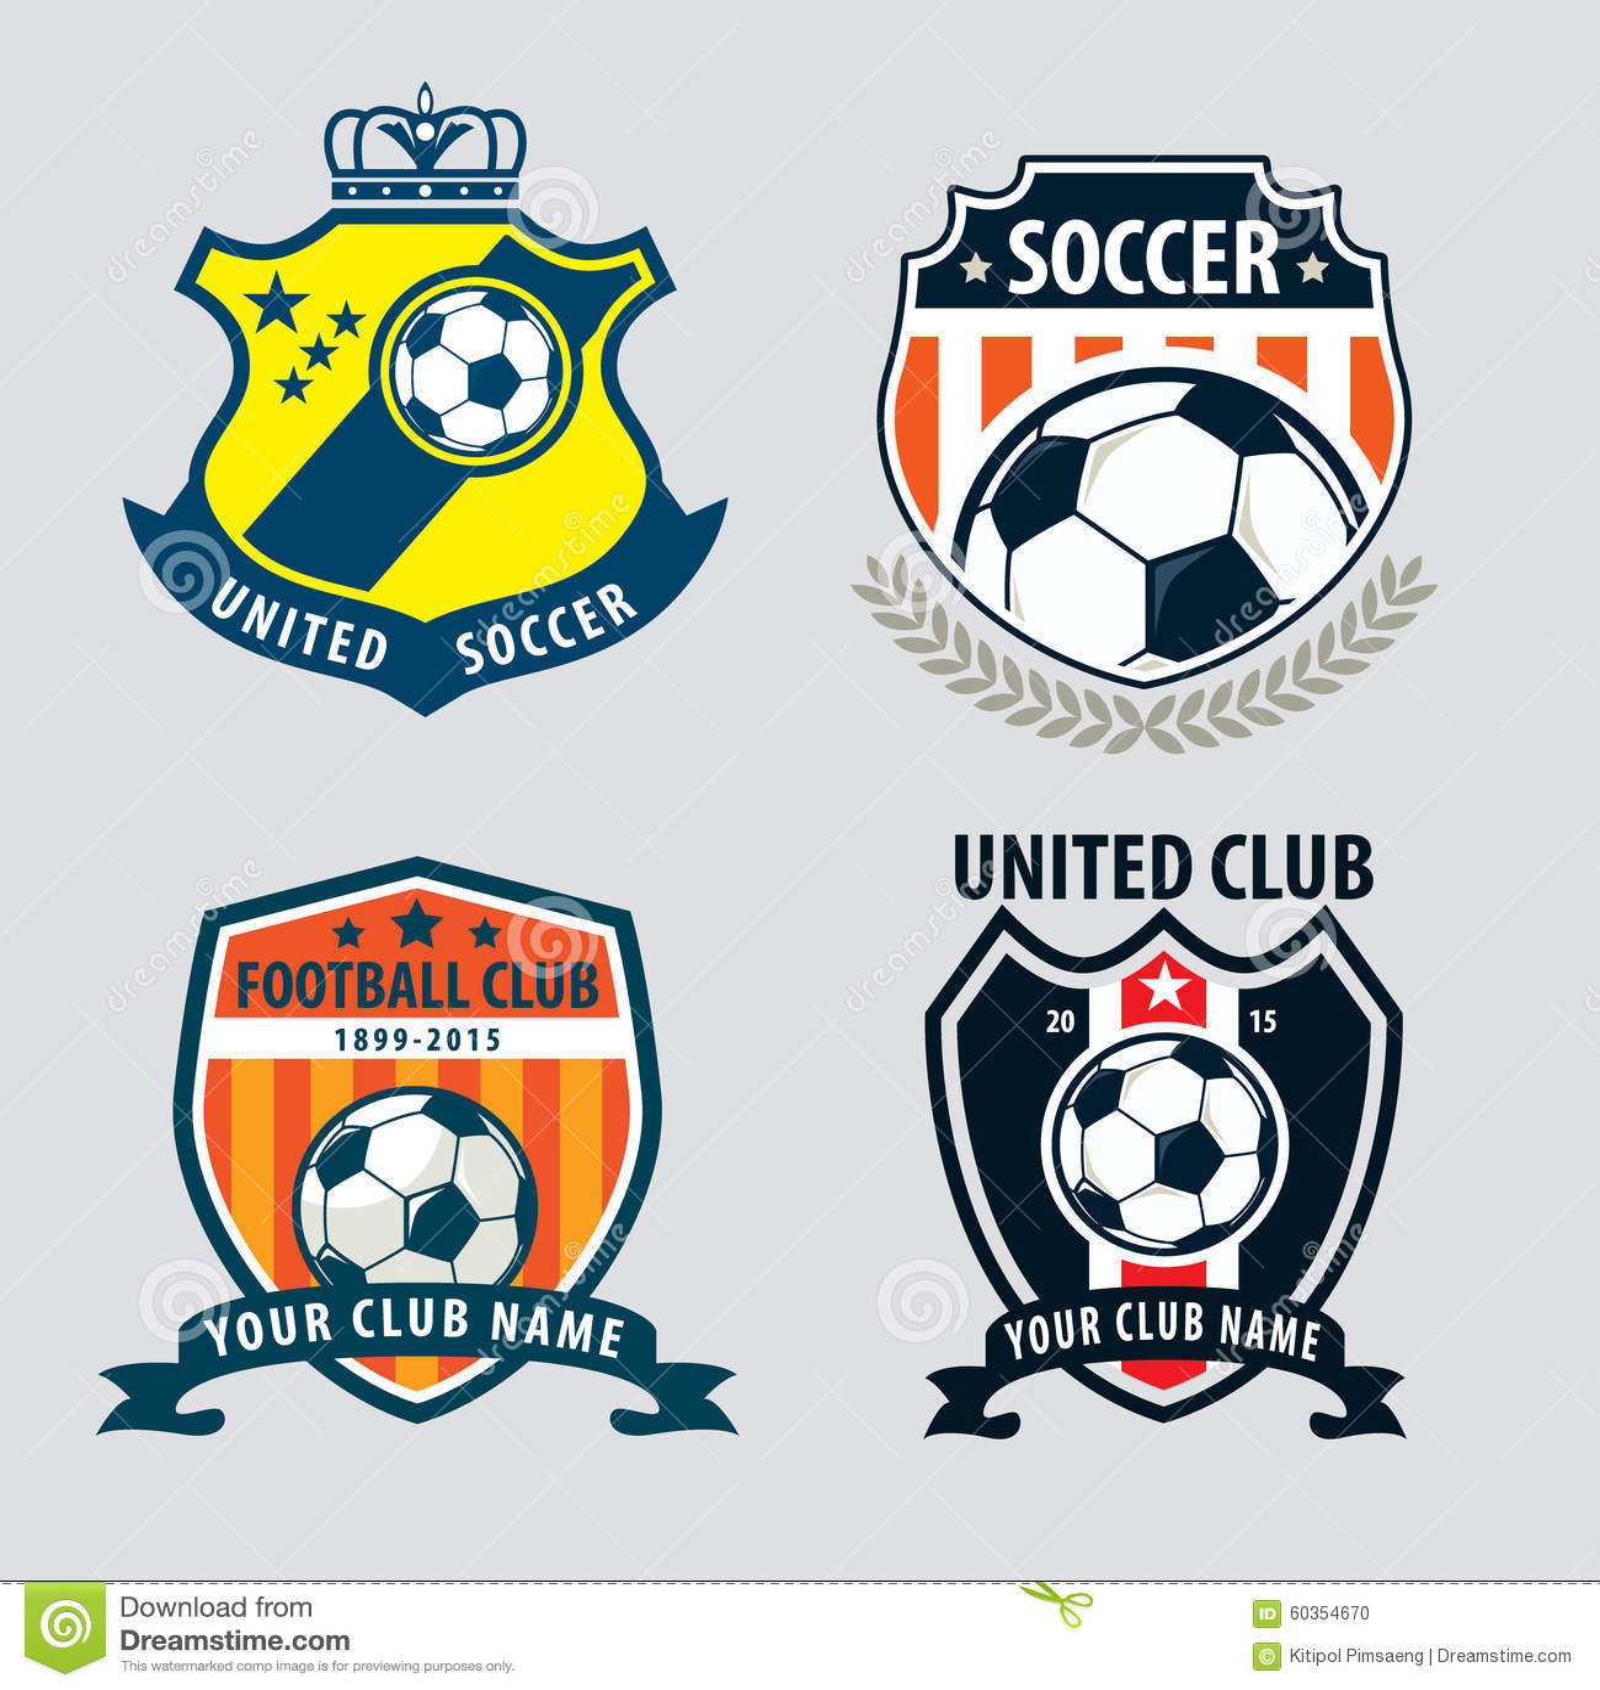 Football badge logo template collection designsoccer teamvecto download football badge logo template collection designsoccer teamvecto stock vector illustration maxwellsz